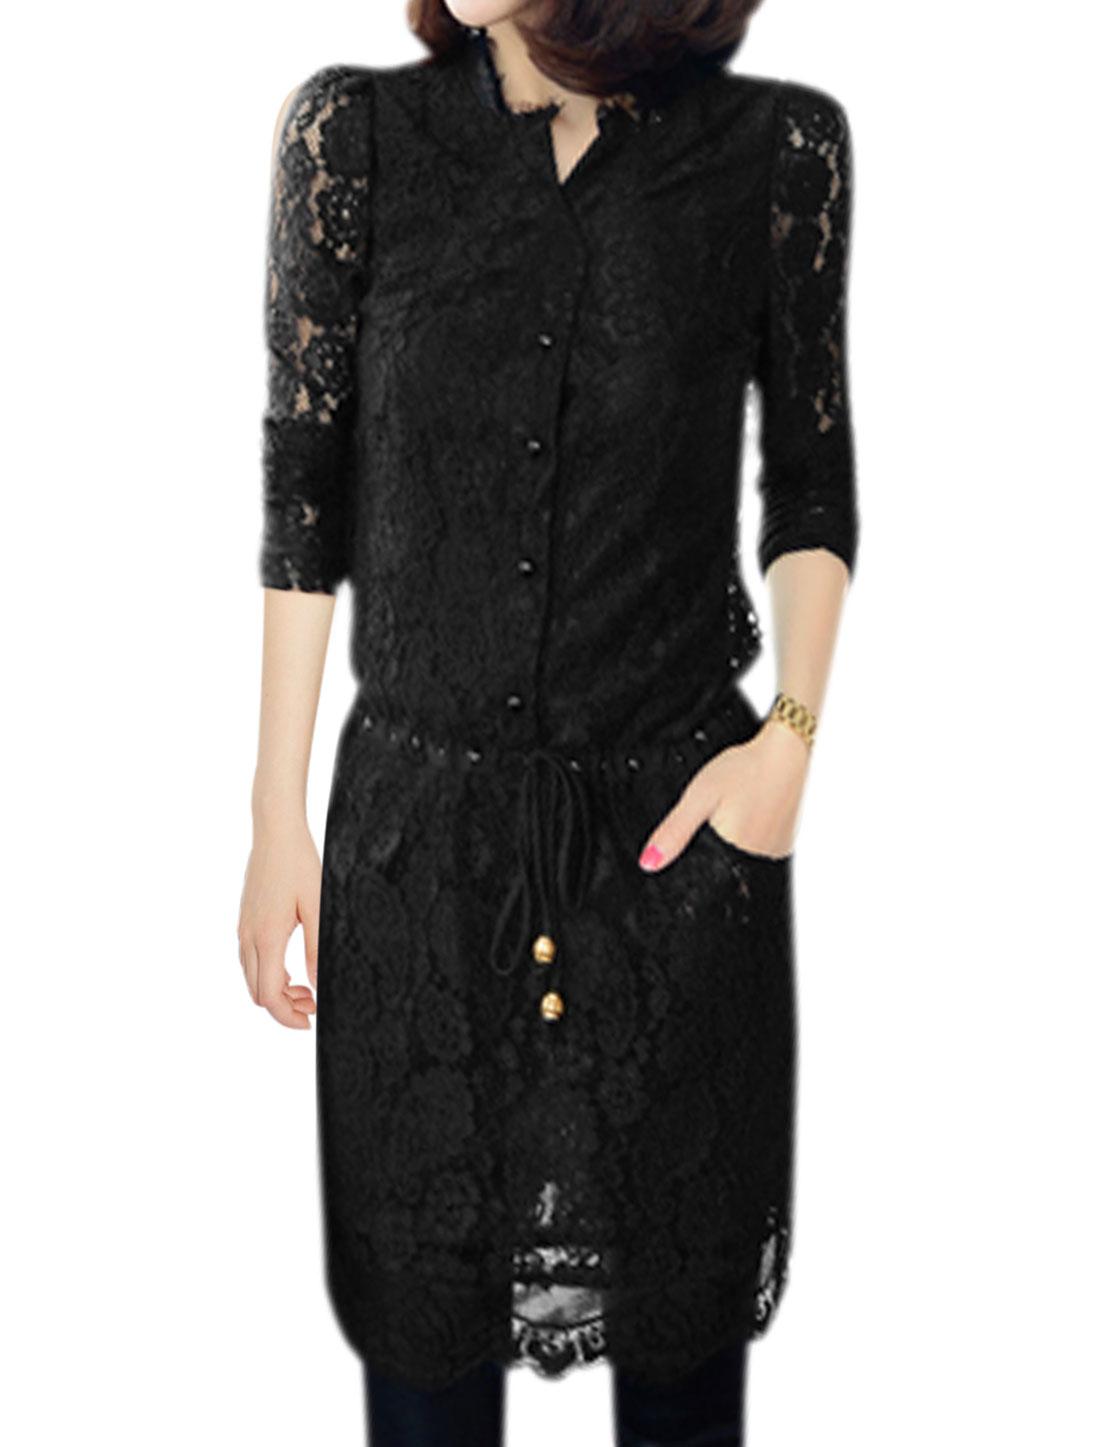 Women Long Sleeves Drawstring Waist See Through Lace Dress Black S